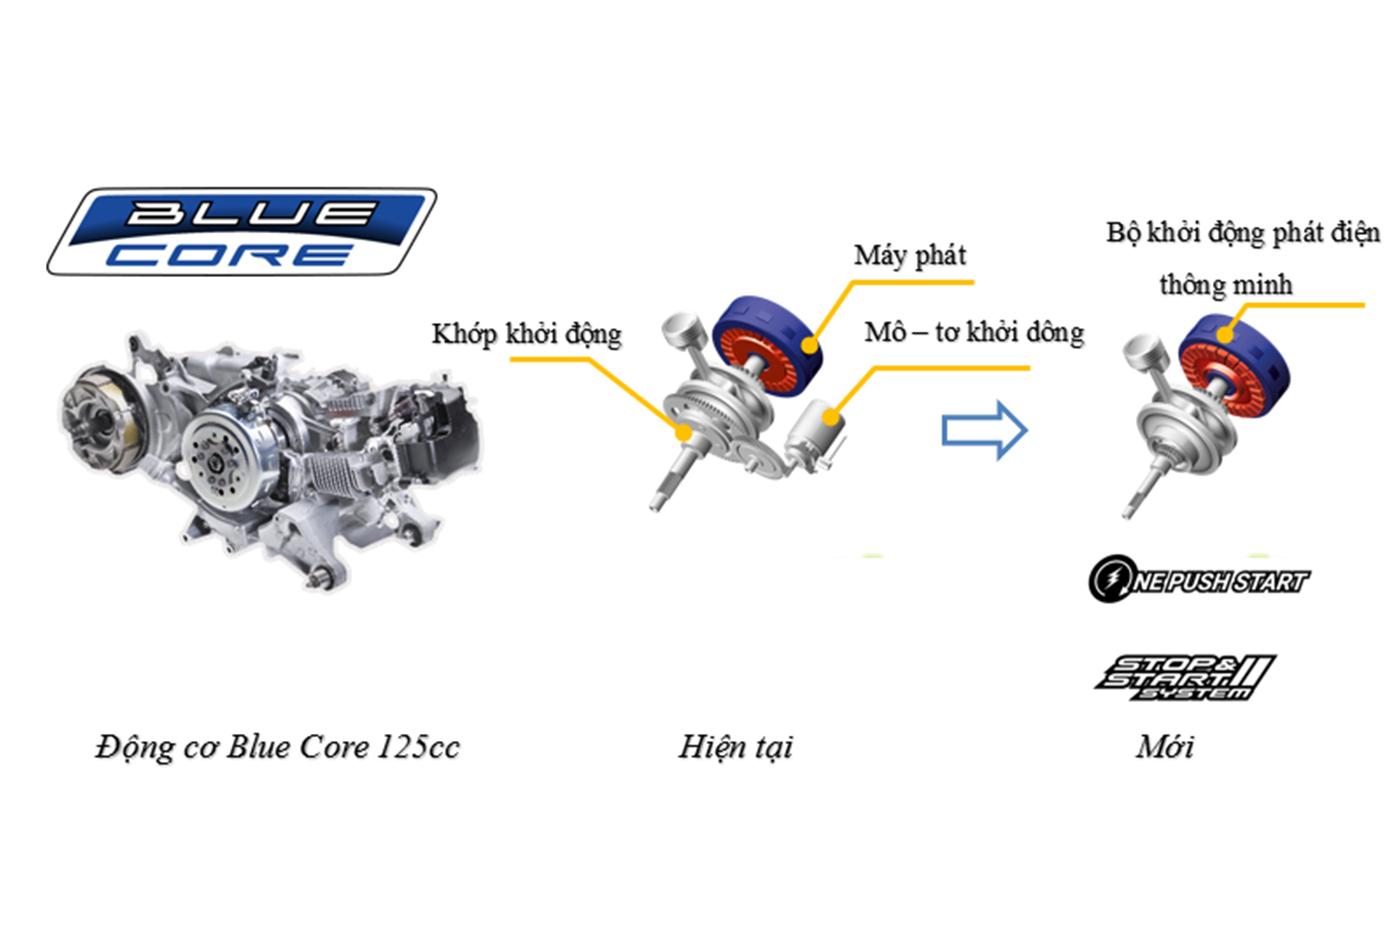 yamaha-motor-viet-nam-ky-niem-5-nam-dong-co-blue-core-va-hanh-trinh-asean-blue-core-touring-3.jpg